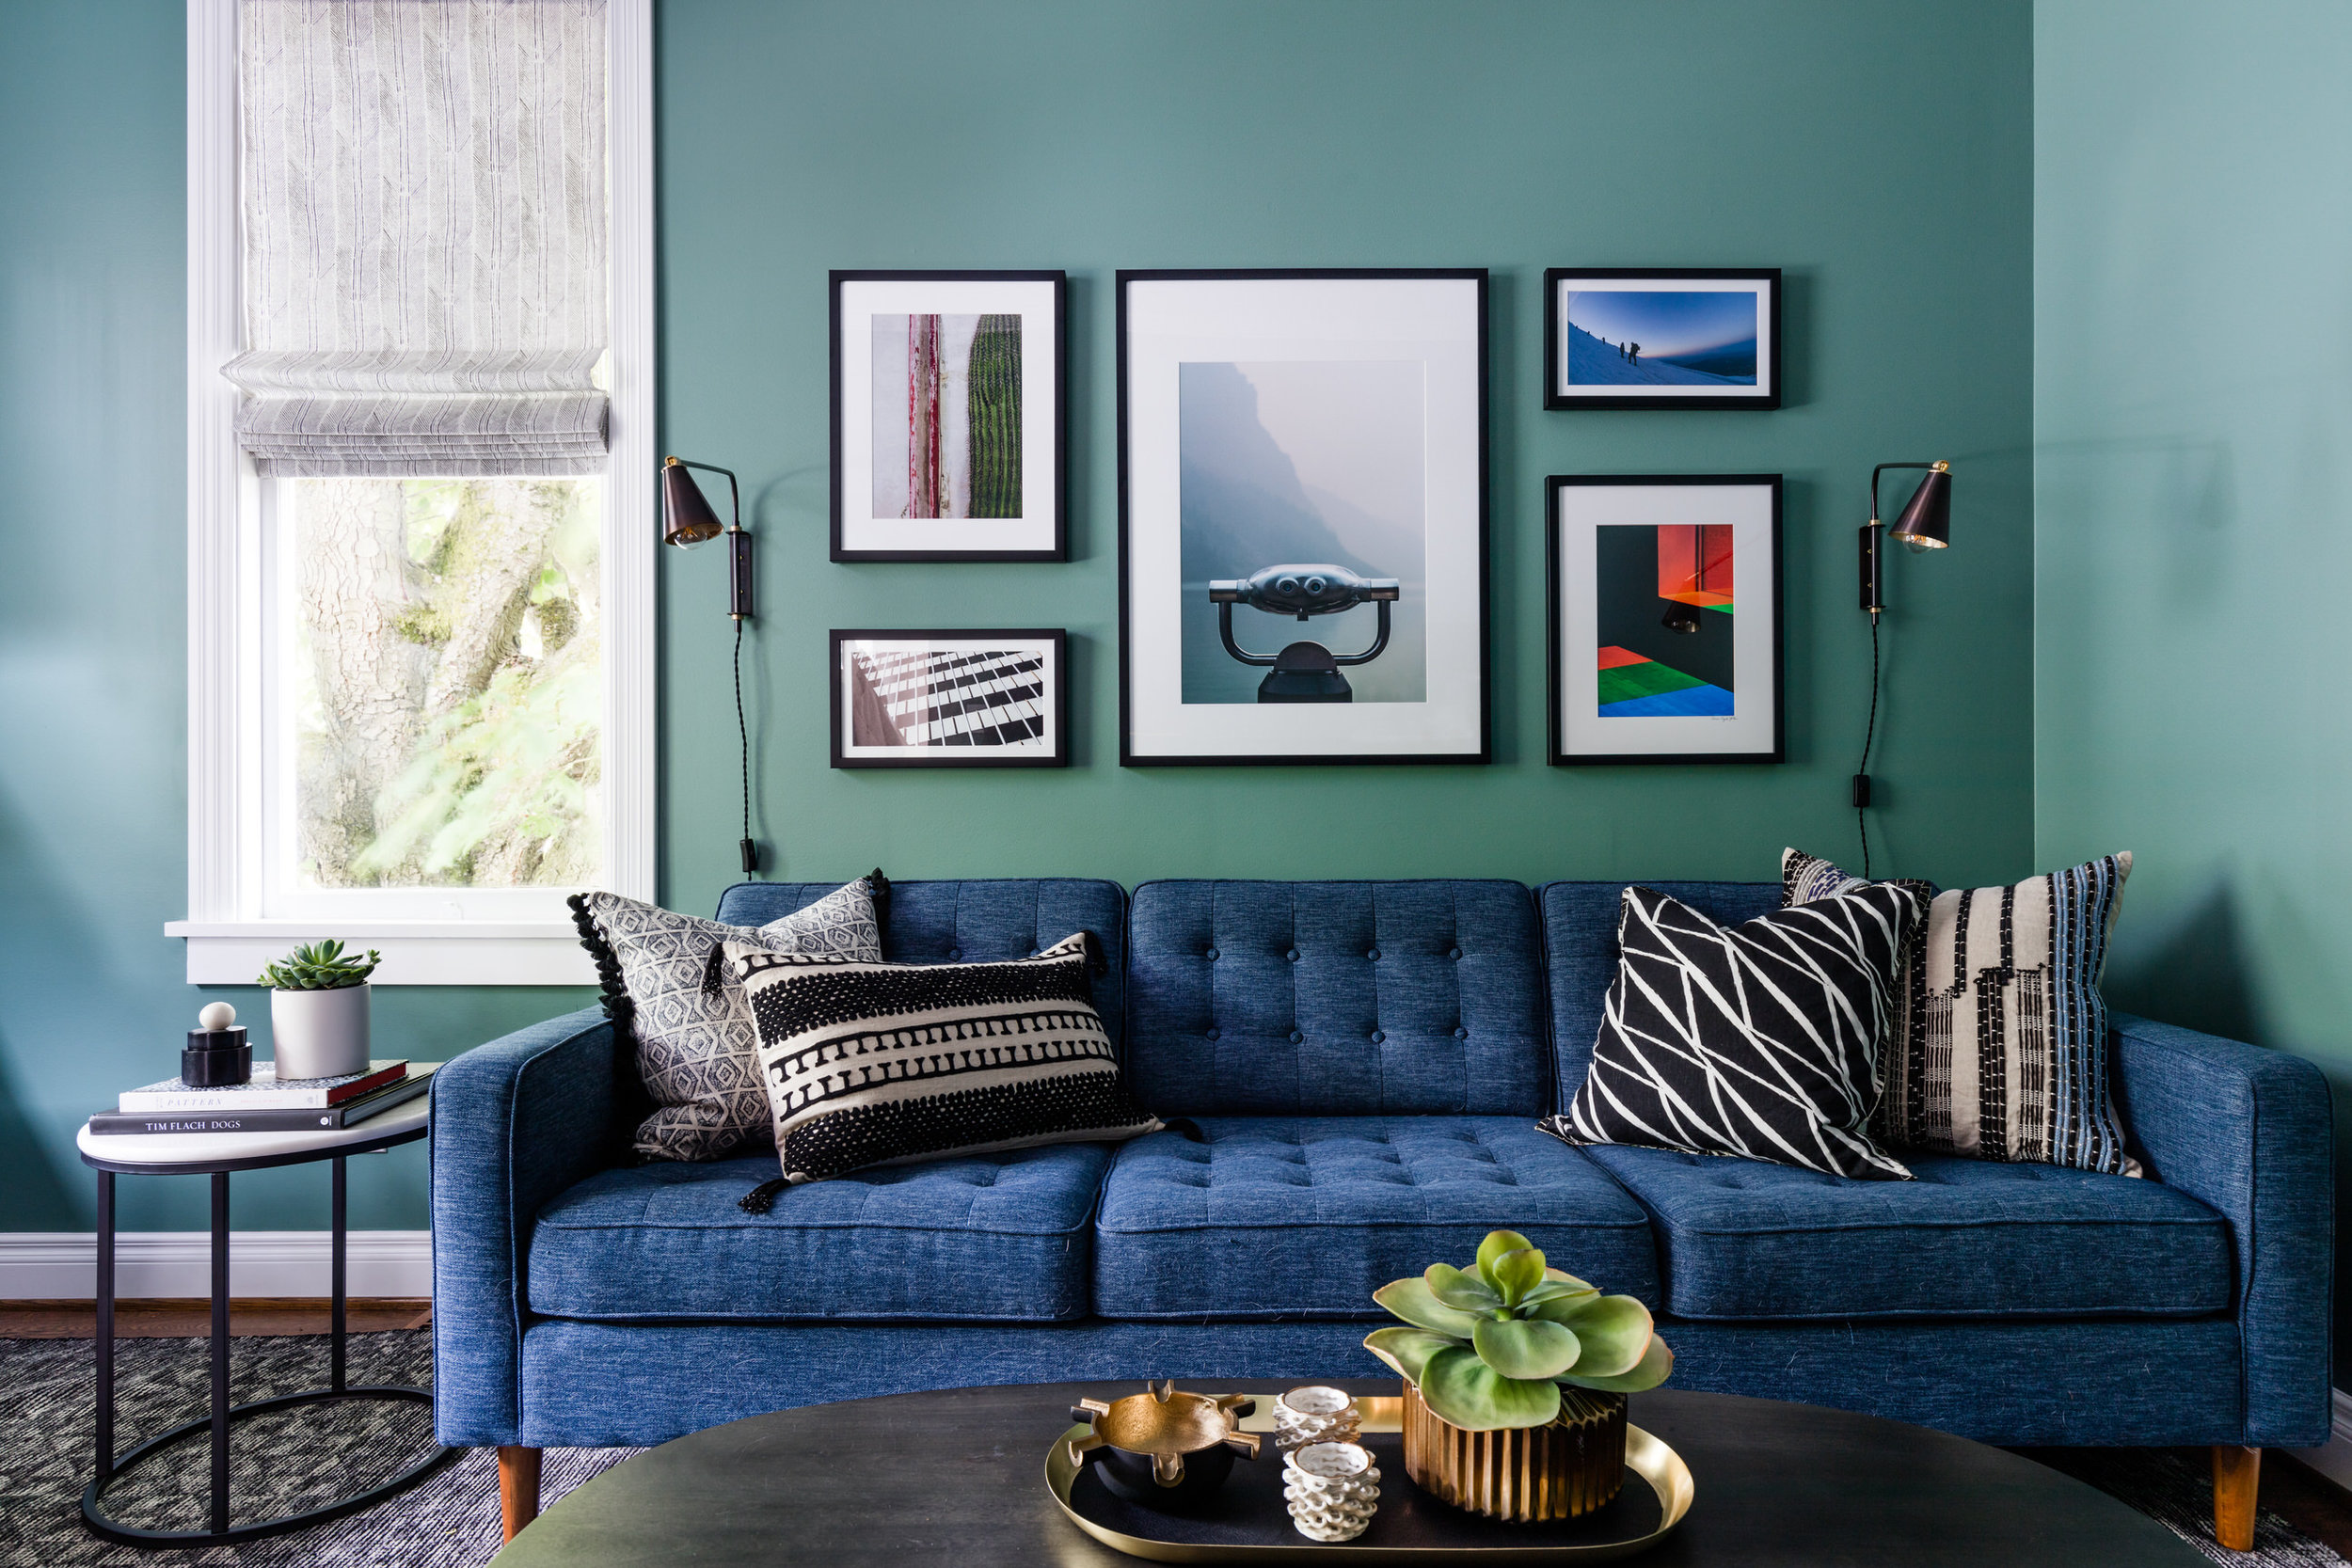 0021-Miranda-Estes-Photography-The-Residency-Bureau-Wallingford-20190515.jpg